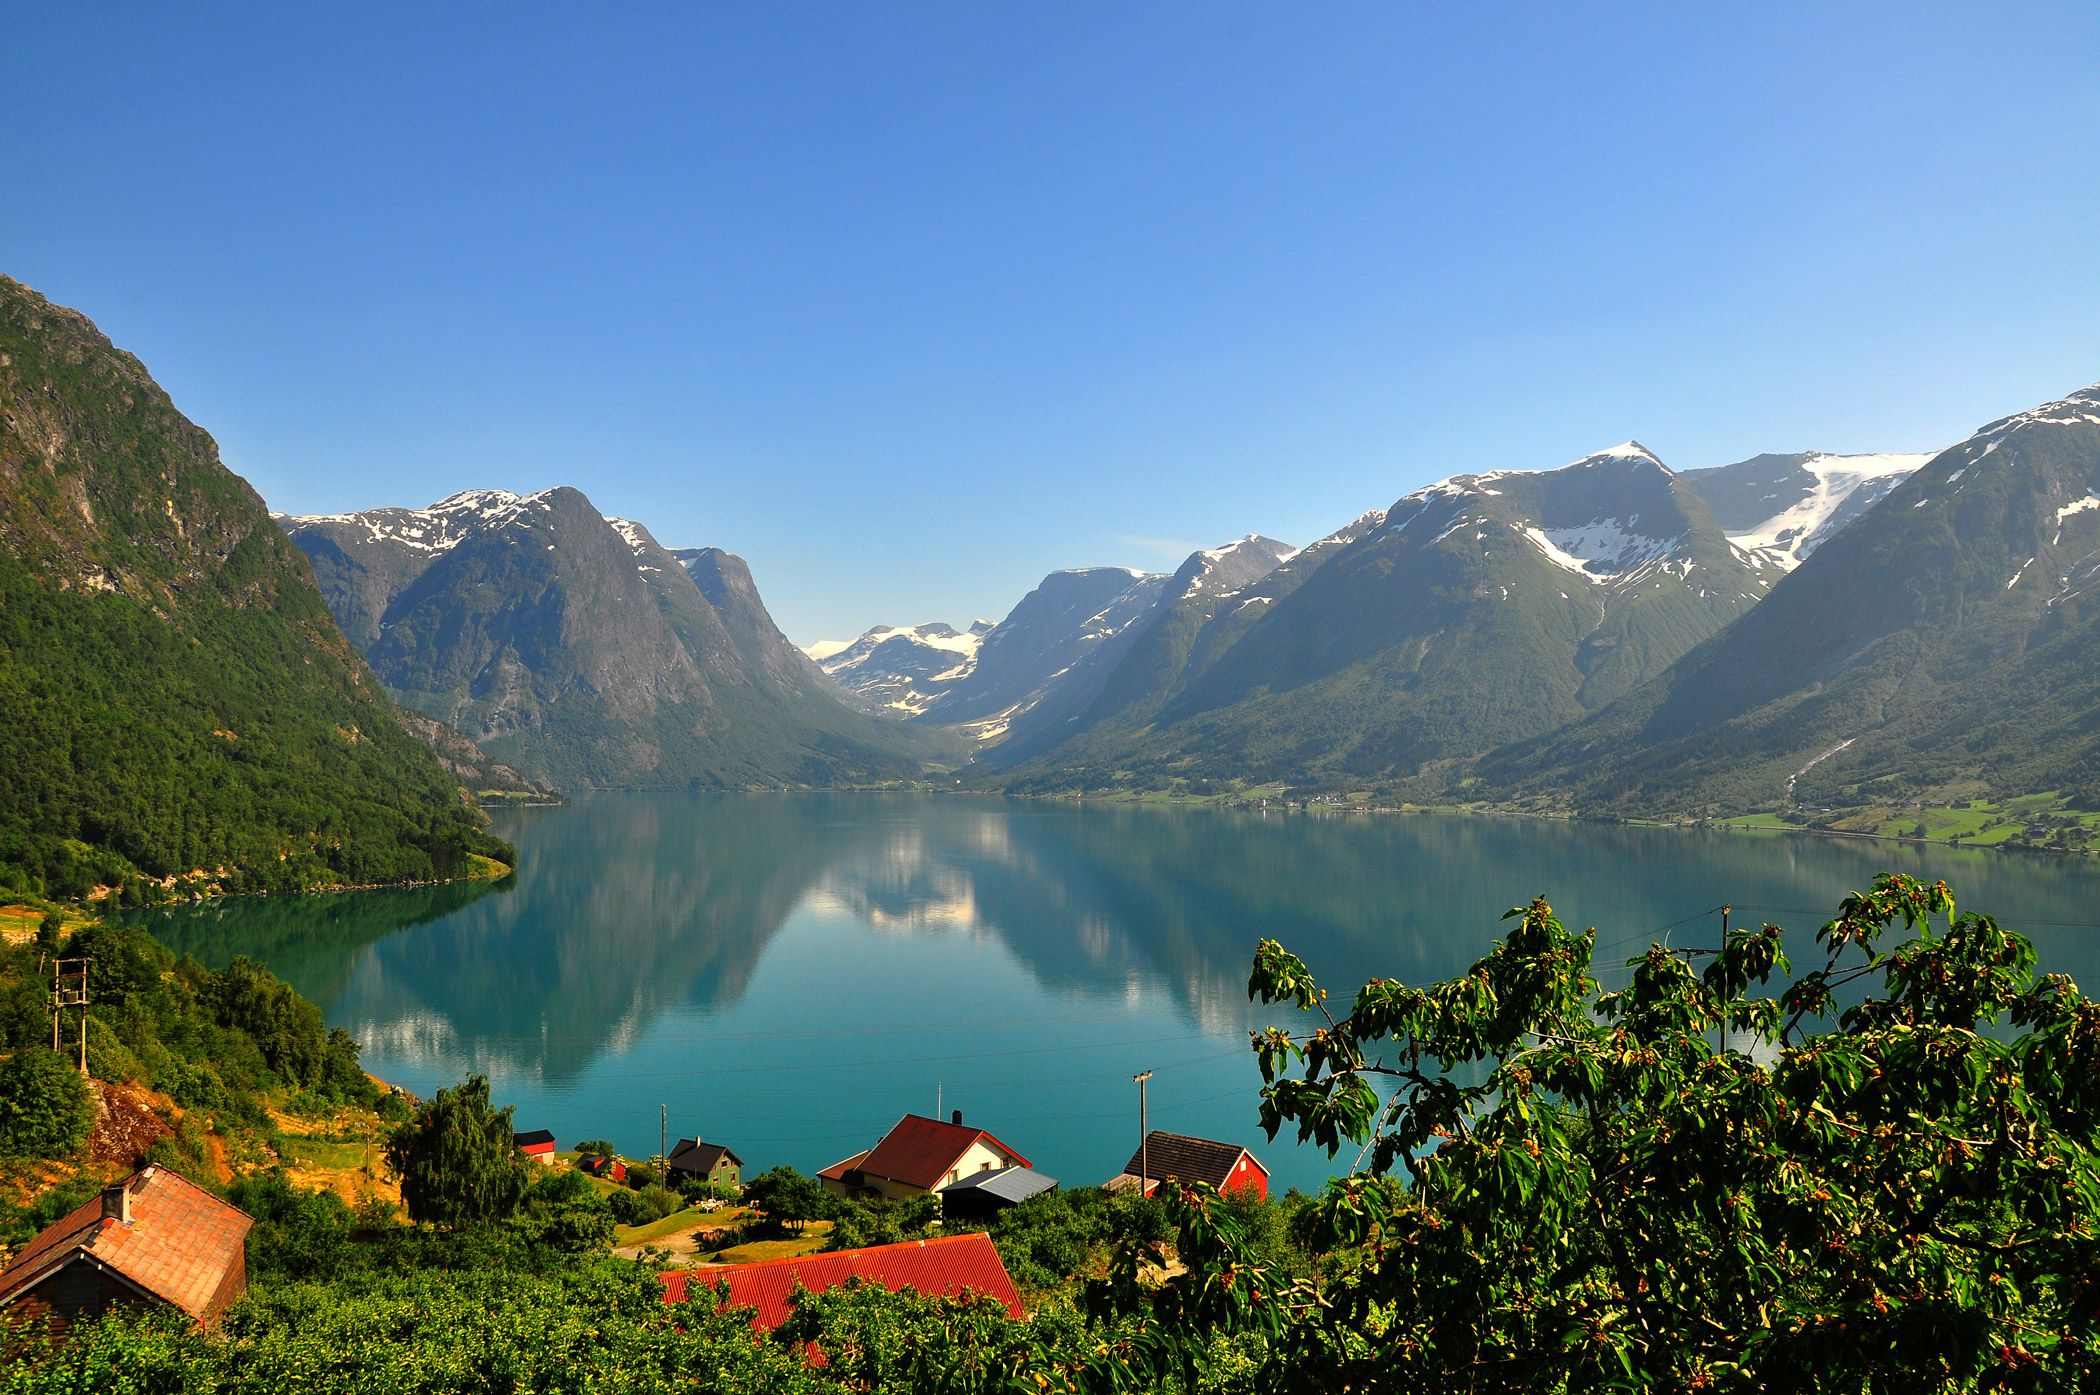 The fruit farms of Flo, Nordfjord, Norway - #landscape #photography #norway Photo credit: stigkk on Flickr